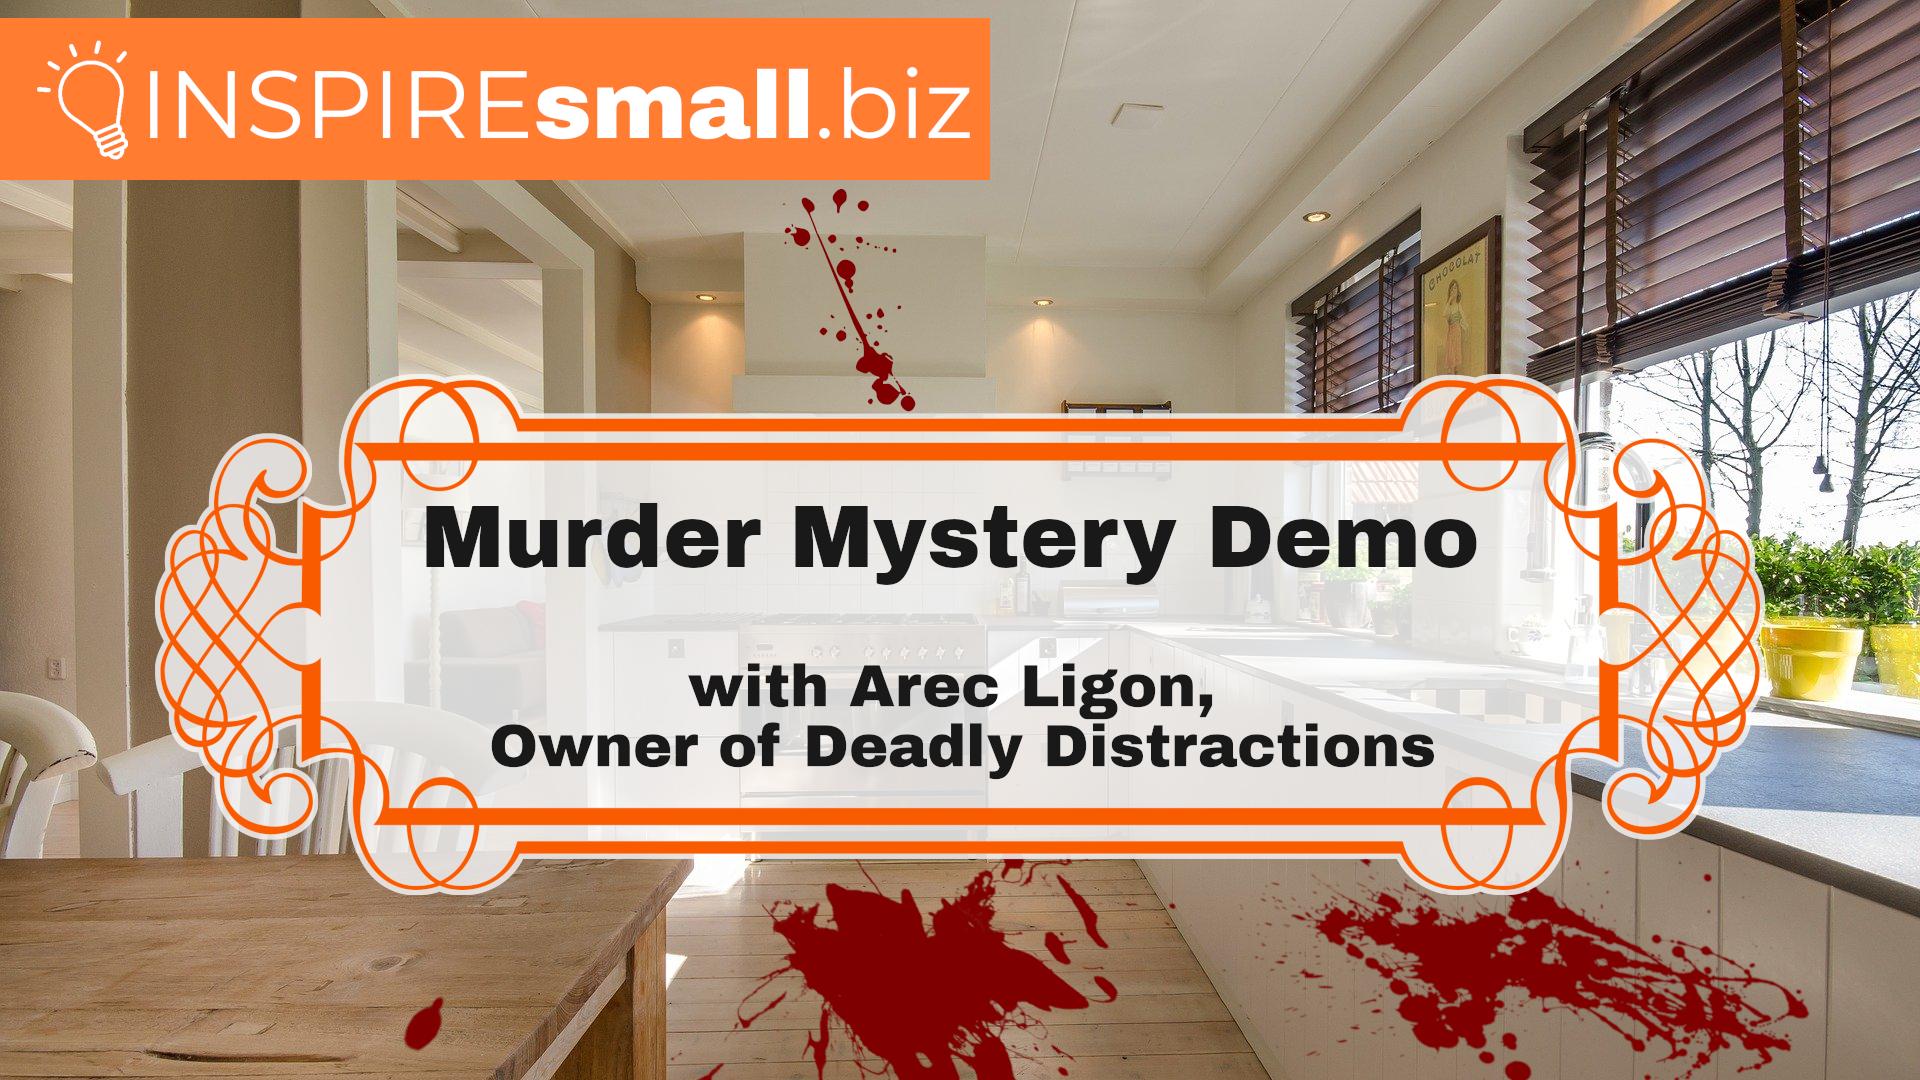 Murder Mystery Demo - INSPIREsmall.biz Monday Networking